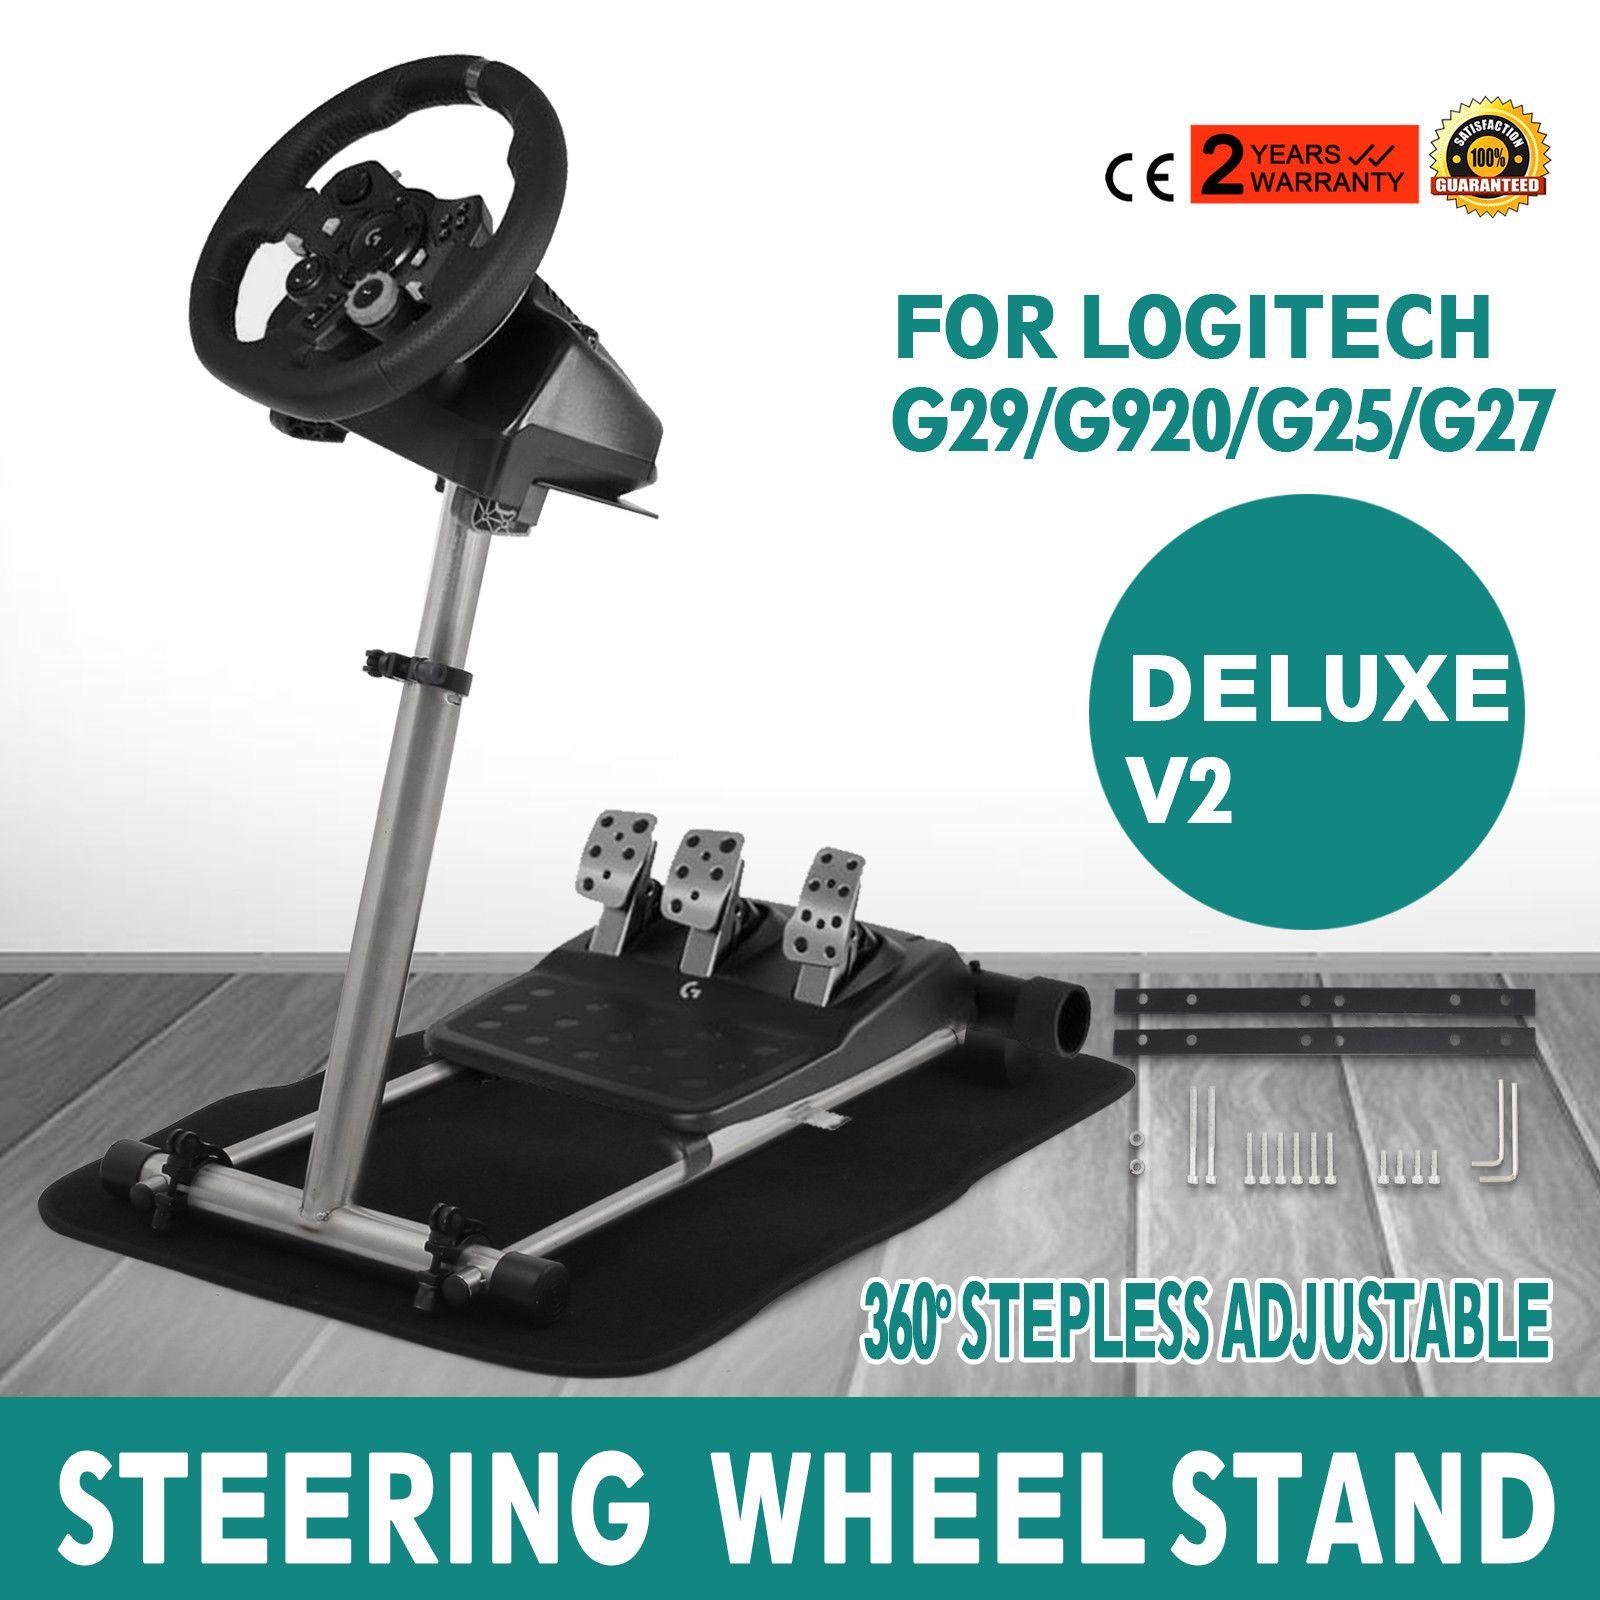 Estante Wheel Stand Pro para Logitech G29/G920 & G25/G27